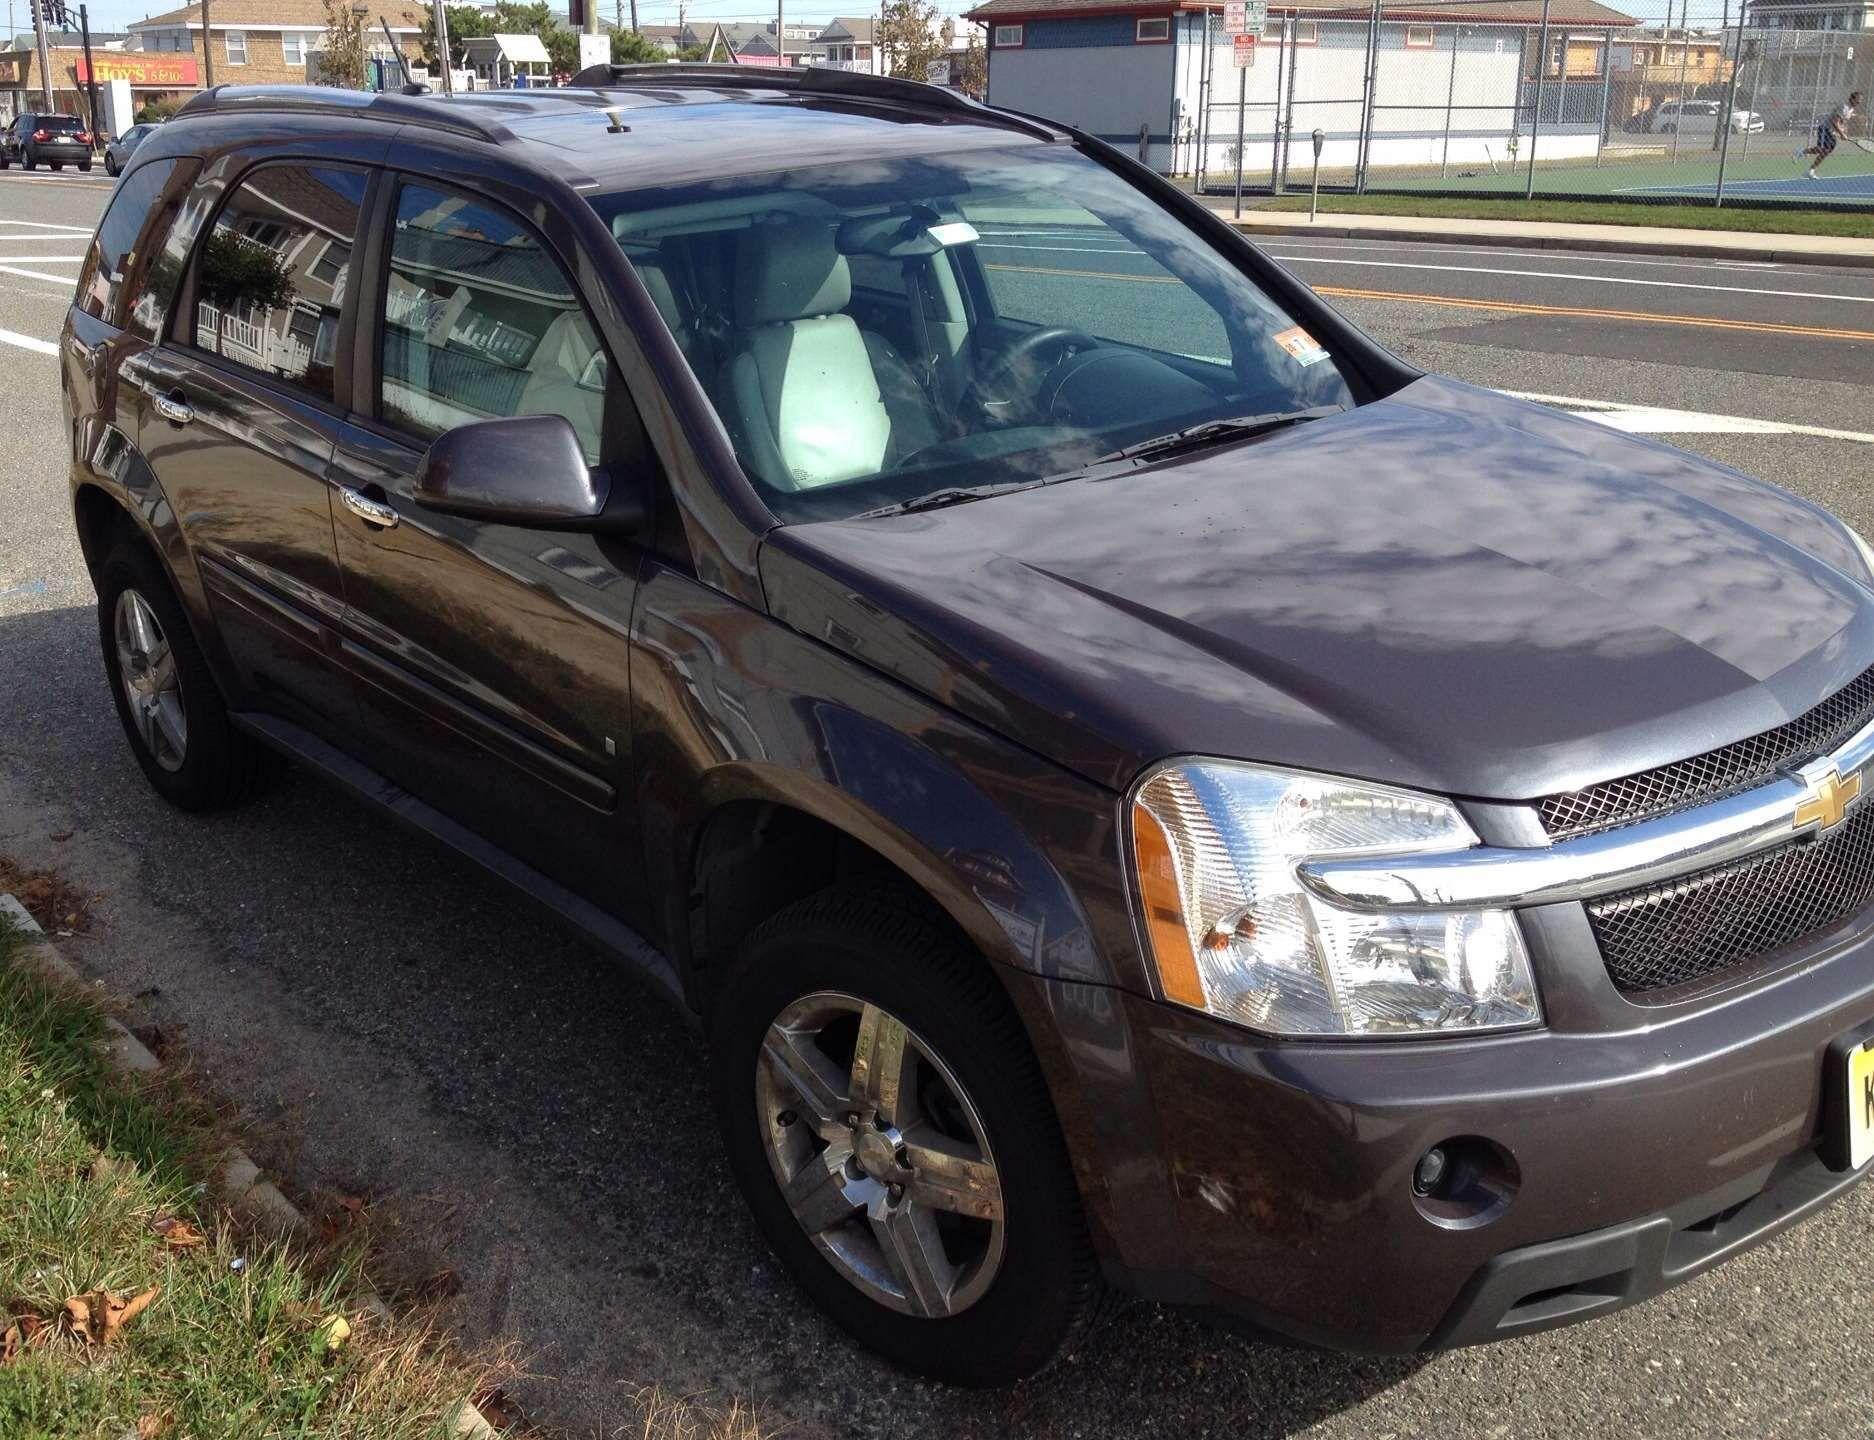 Make Chevrolet Model Equinox Year 2008 Body Style Exterior